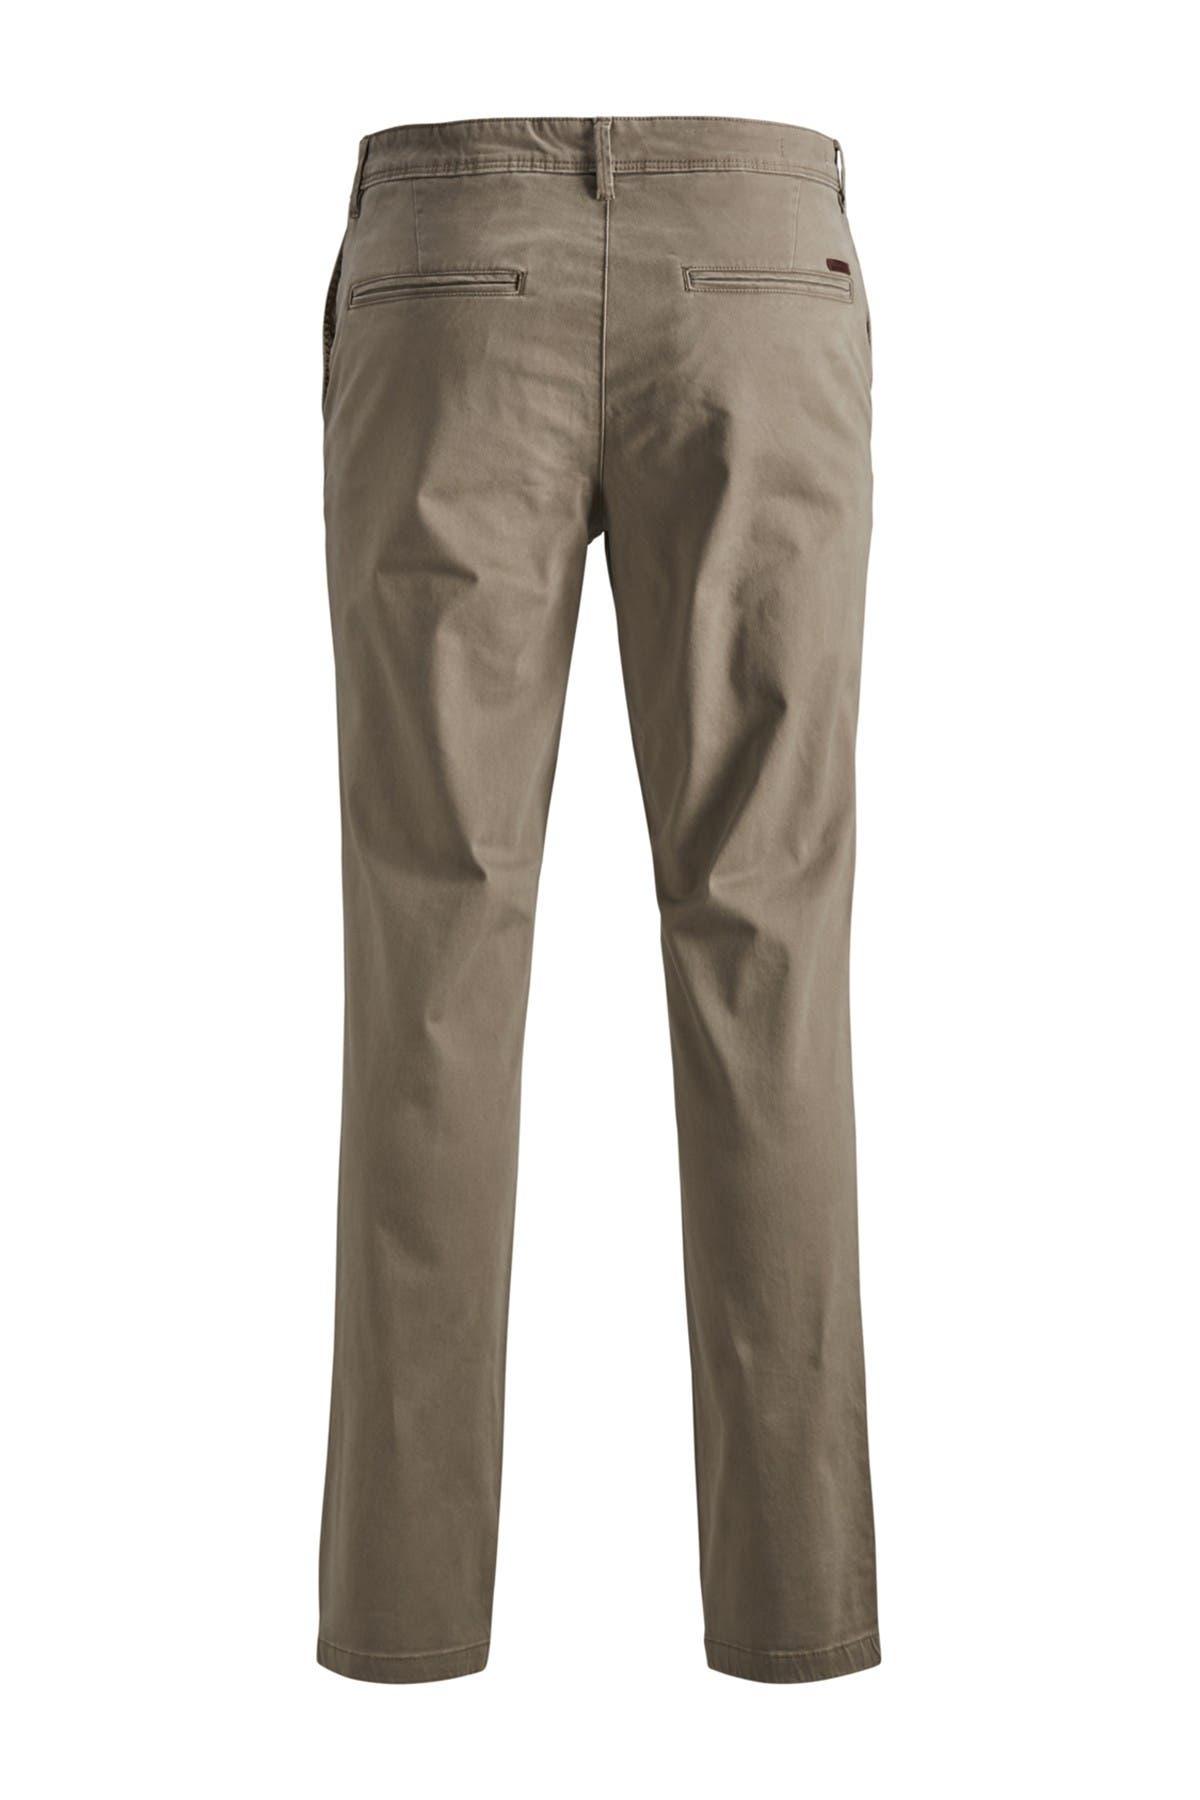 Image of JACK & JONES Bowie Slim Fit Pants